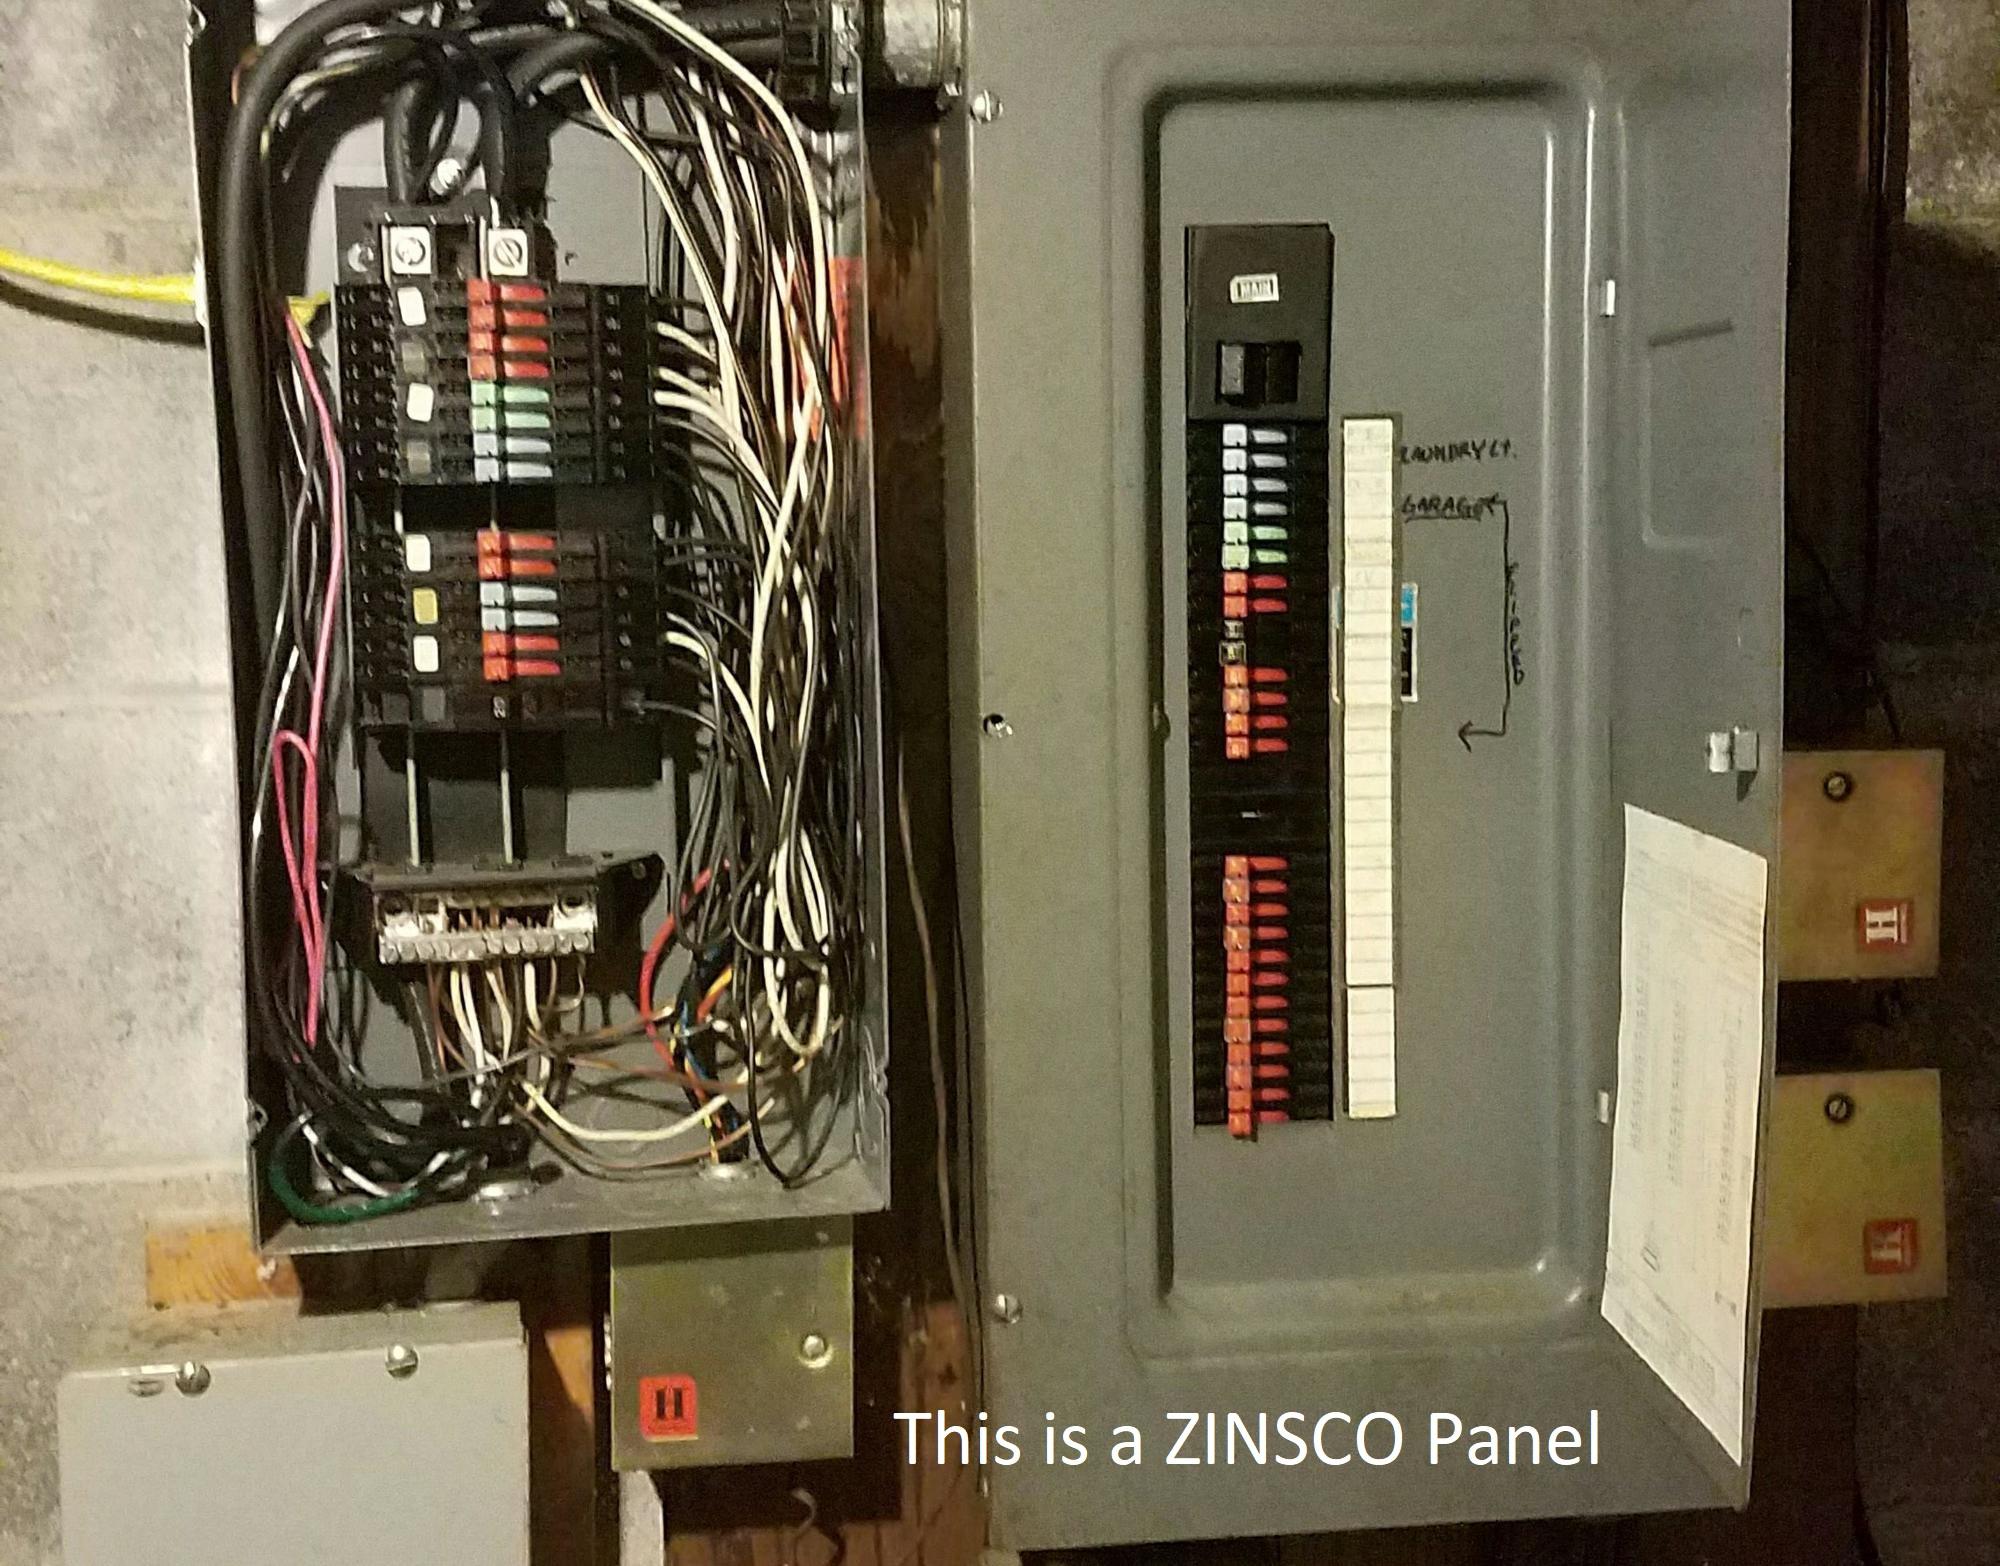 Zinco Panel